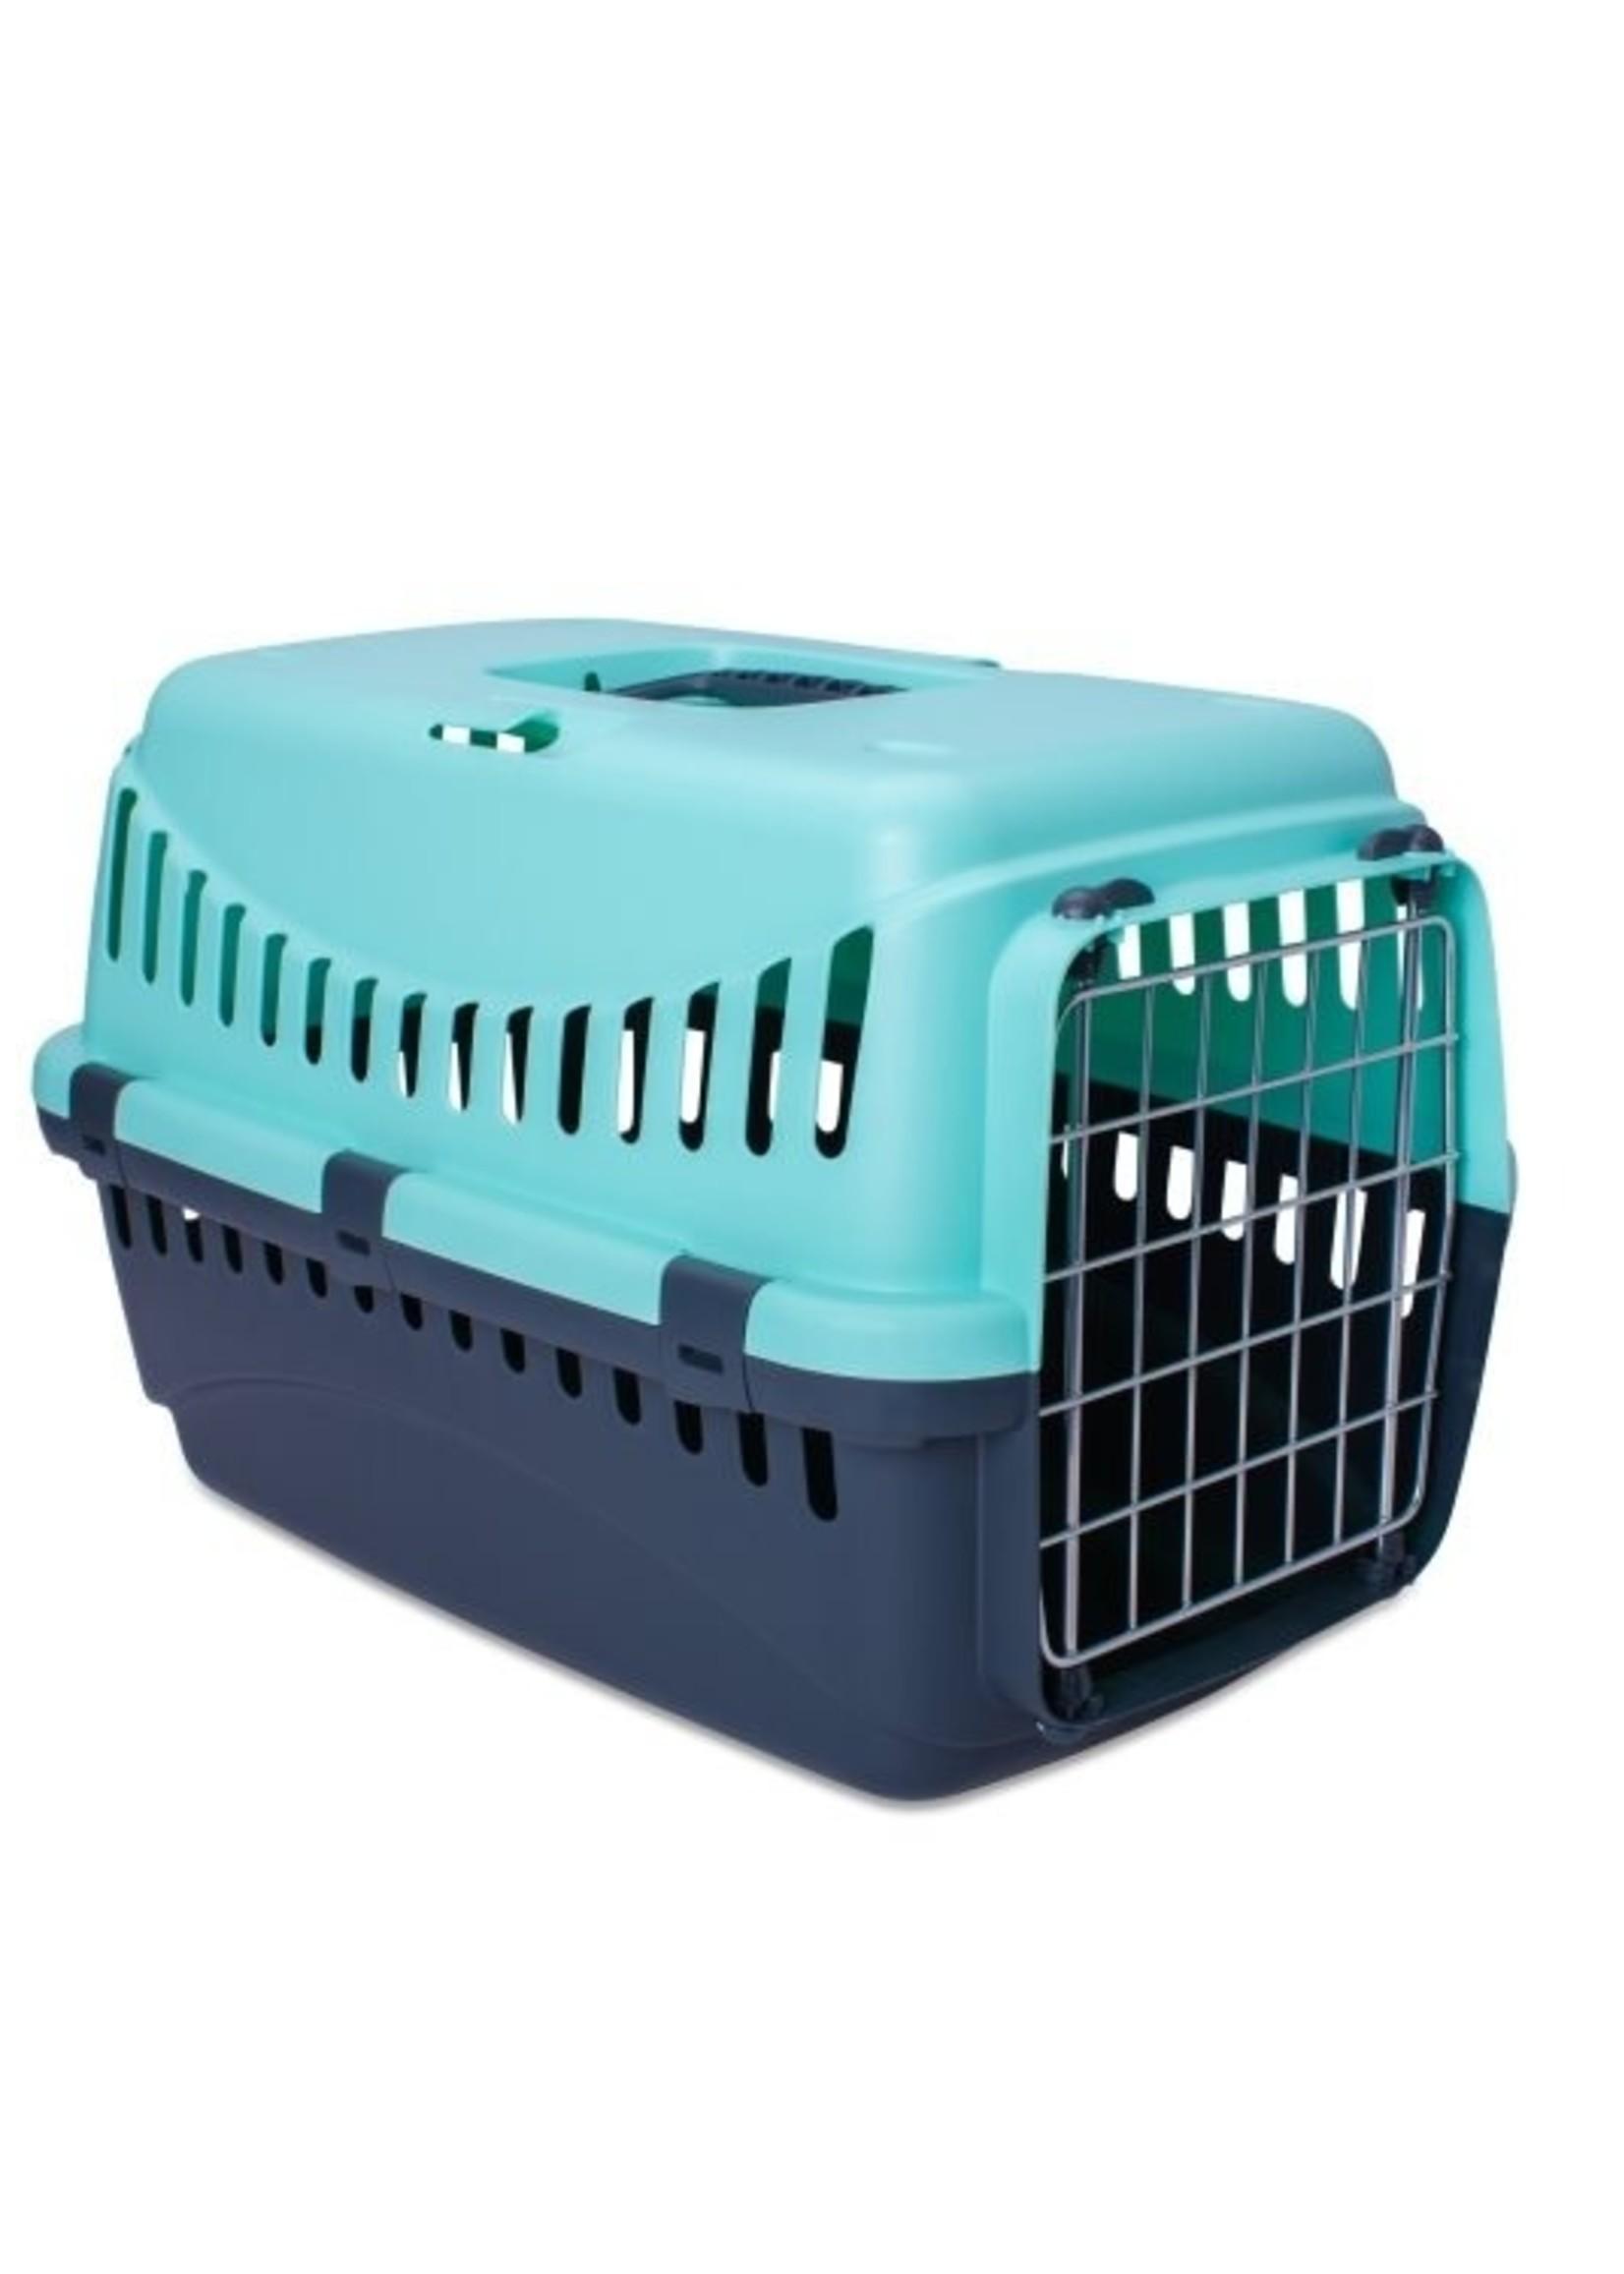 Bergamo Bergamo Gipsy Pet Carrier - Small - Mint